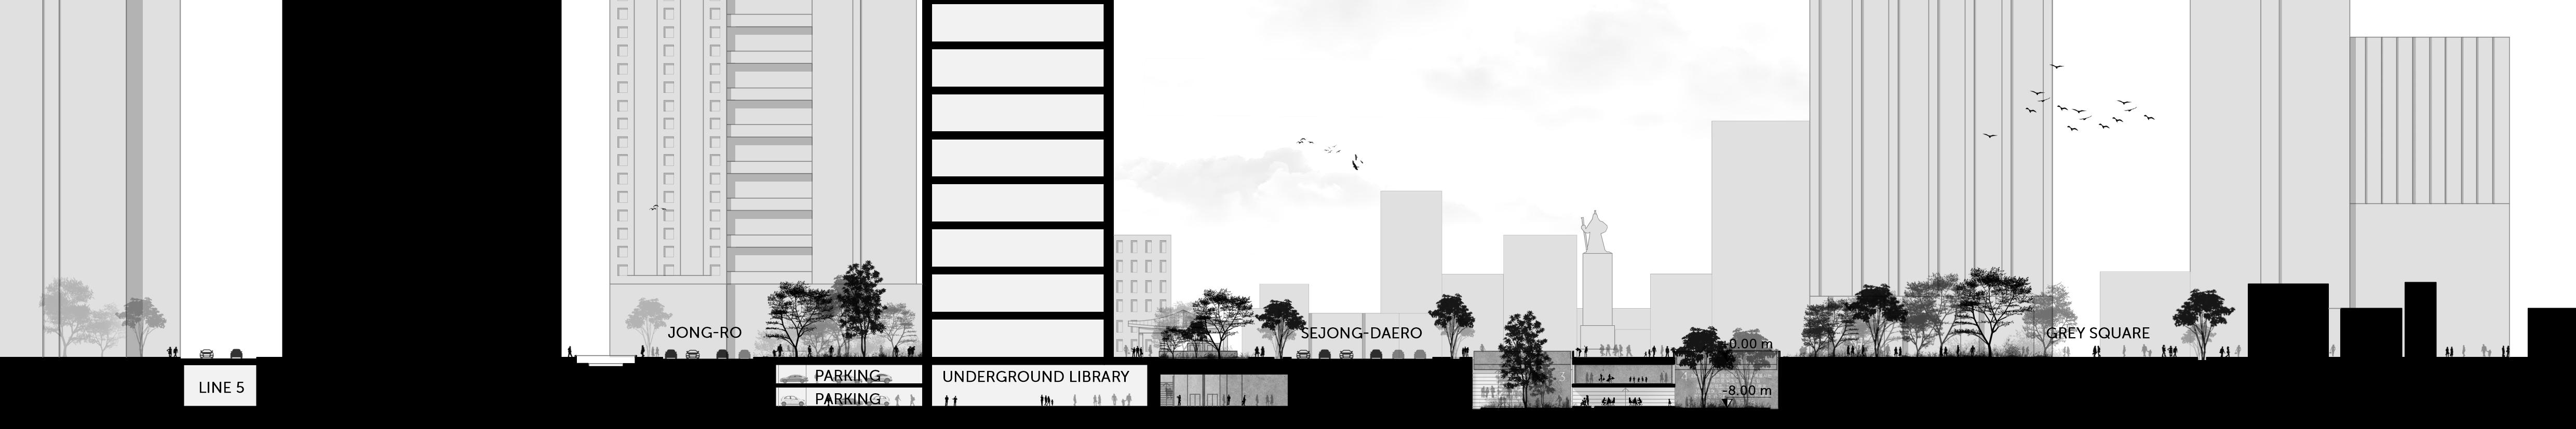 TARI-Architects© (15)